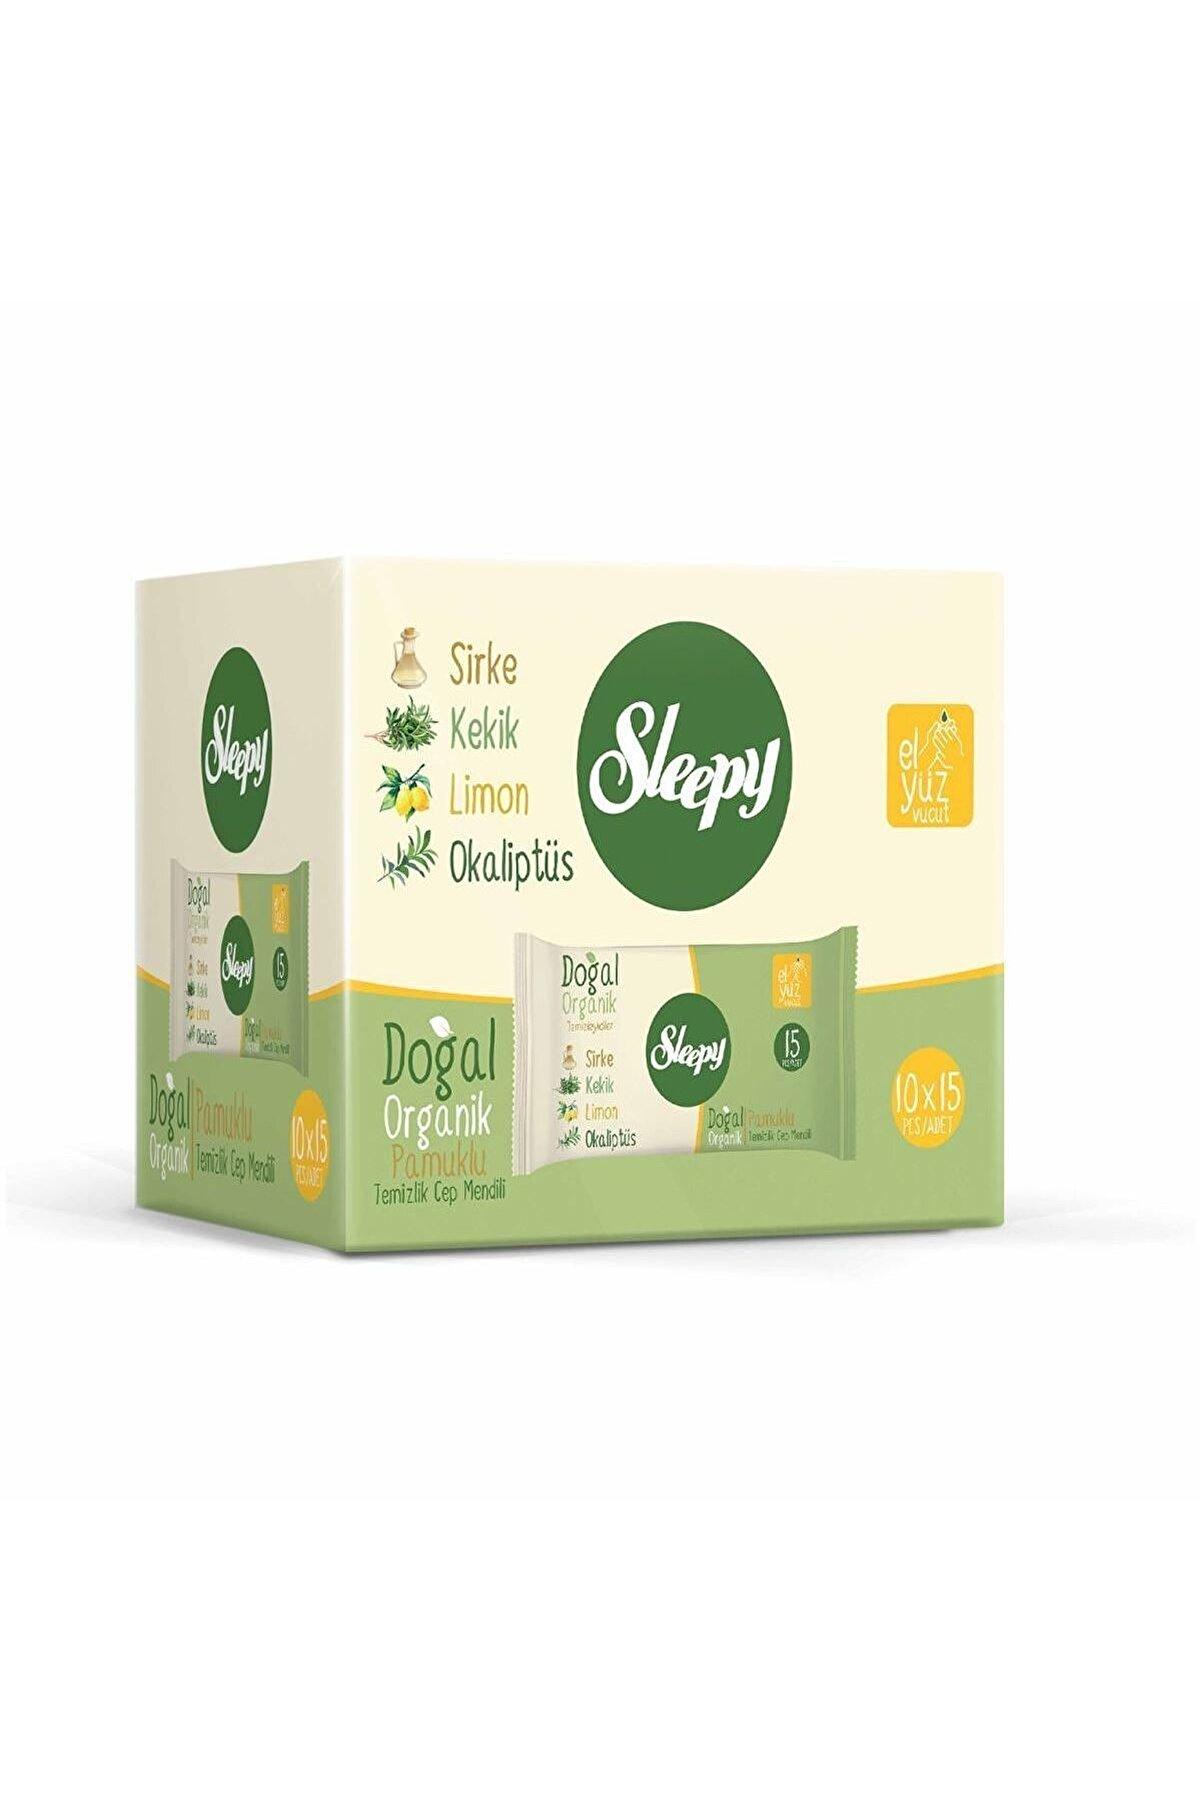 Sleepy Doğal Organik Pamuklu Cep Mendilli 150 Yaprak (10X15)